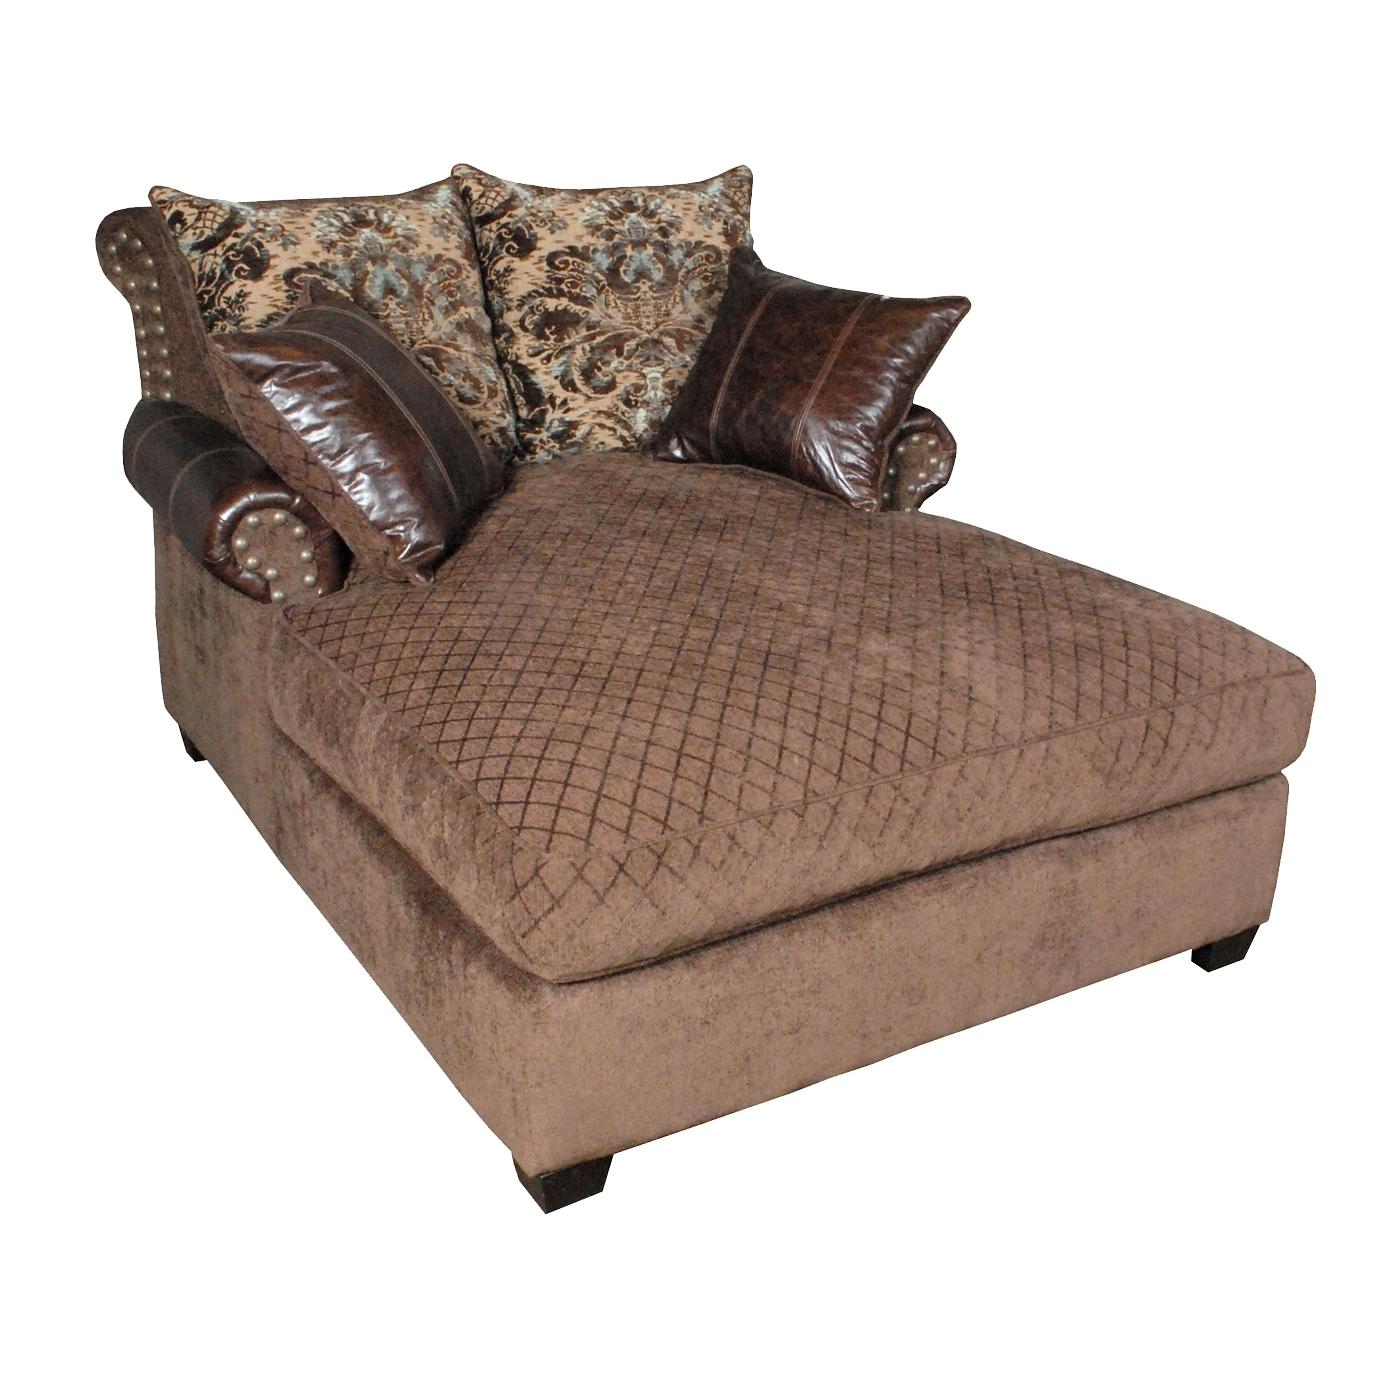 Oversized Chaise Lounge – Decofurnish Regarding Current Oversized Indoor Chaise Lounges (View 10 of 15)